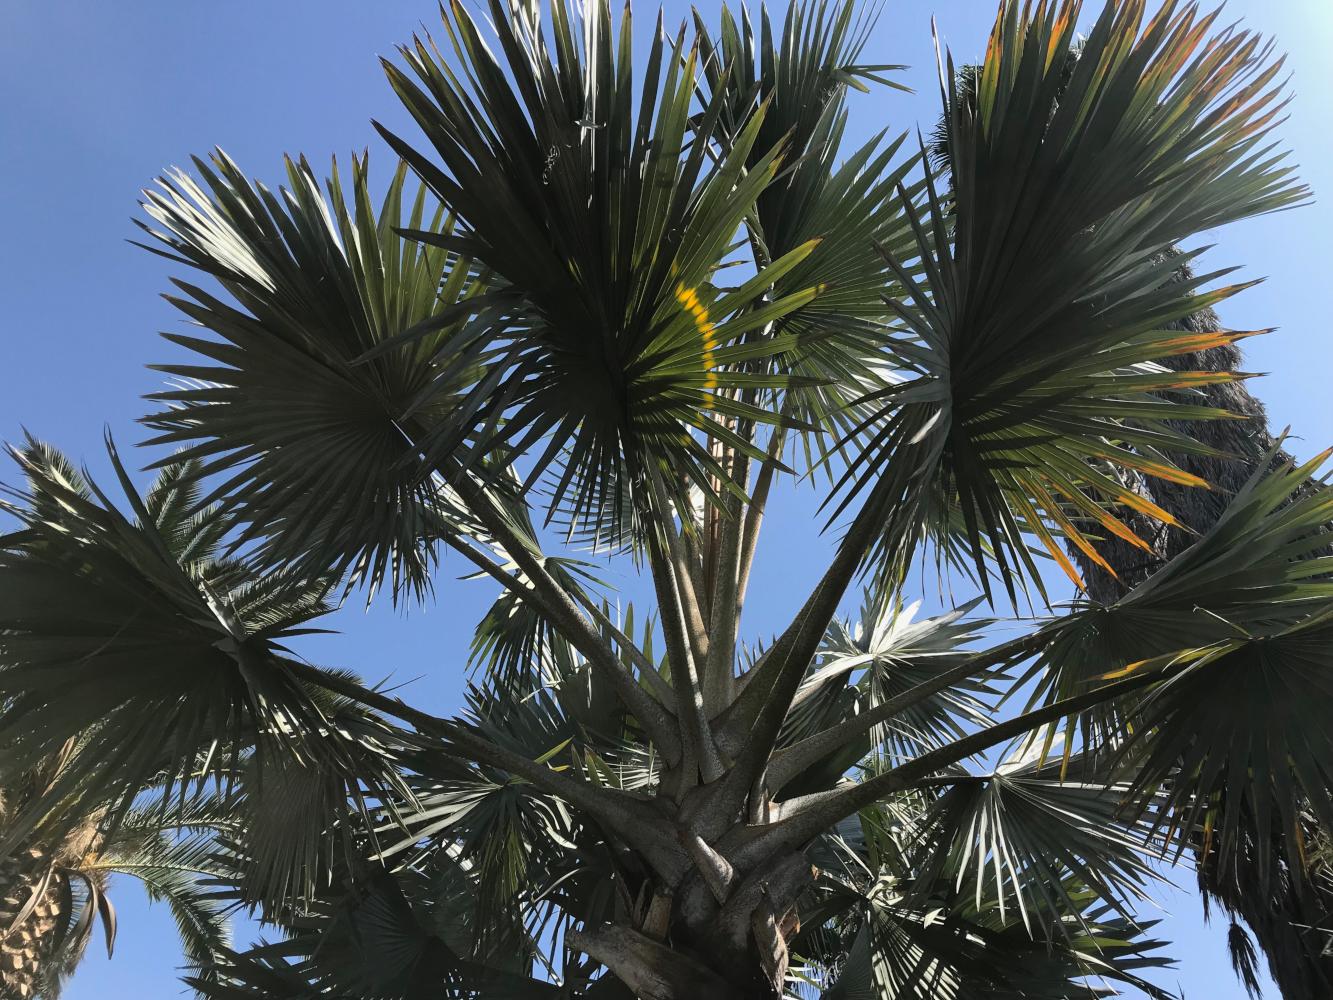 Bismarck Palm canopy